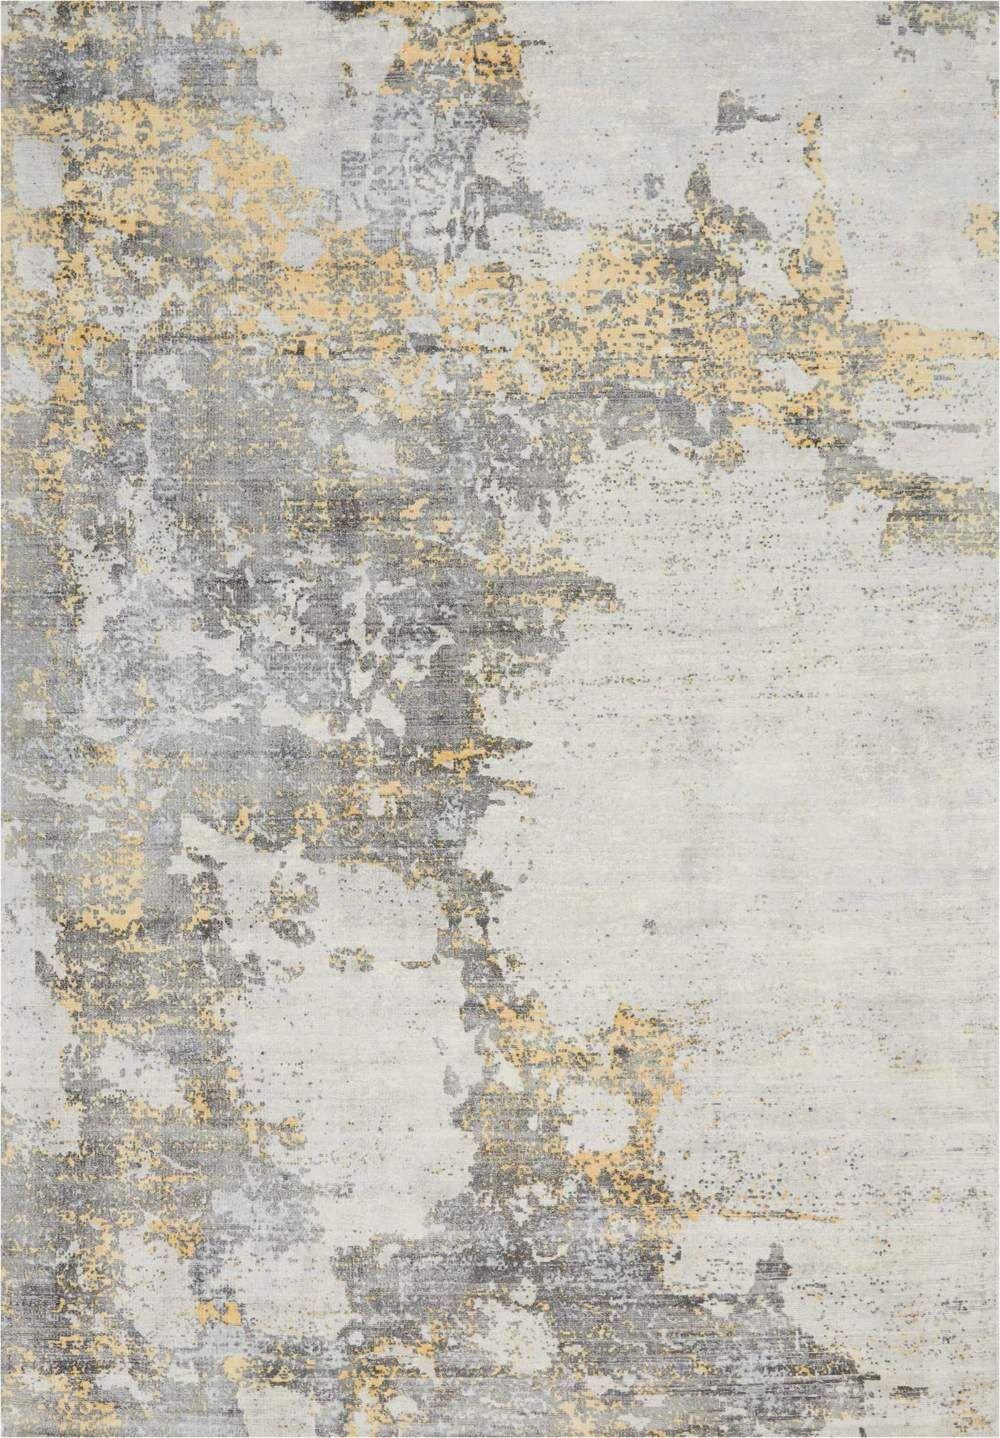 Nourison Ki37 Safari Dreams Ki371 Area Rug Rugs On Carpet Gold Living Room Grey And Gold #safari #rugs #living #room